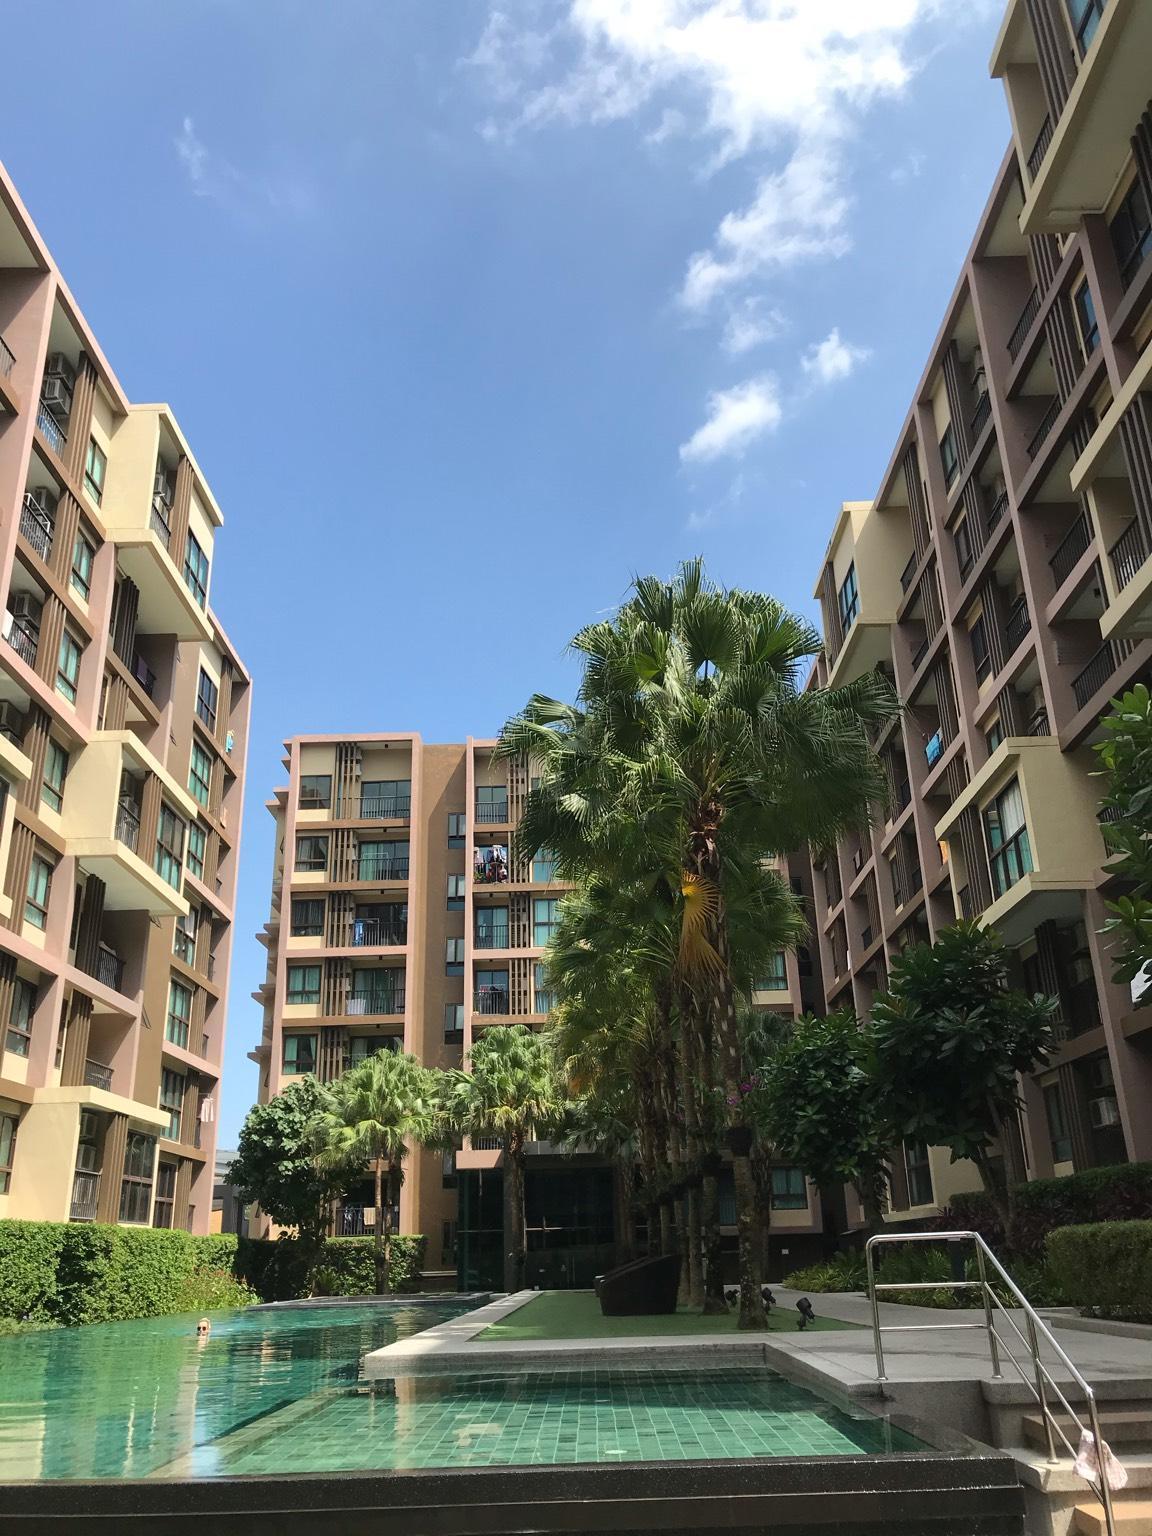 Zcape3 condominium central Phuket อพาร์ตเมนต์ 1 ห้องนอน 1 ห้องน้ำส่วนตัว ขนาด 28 ตร.ม. – ตัวเมืองภูเก็ต